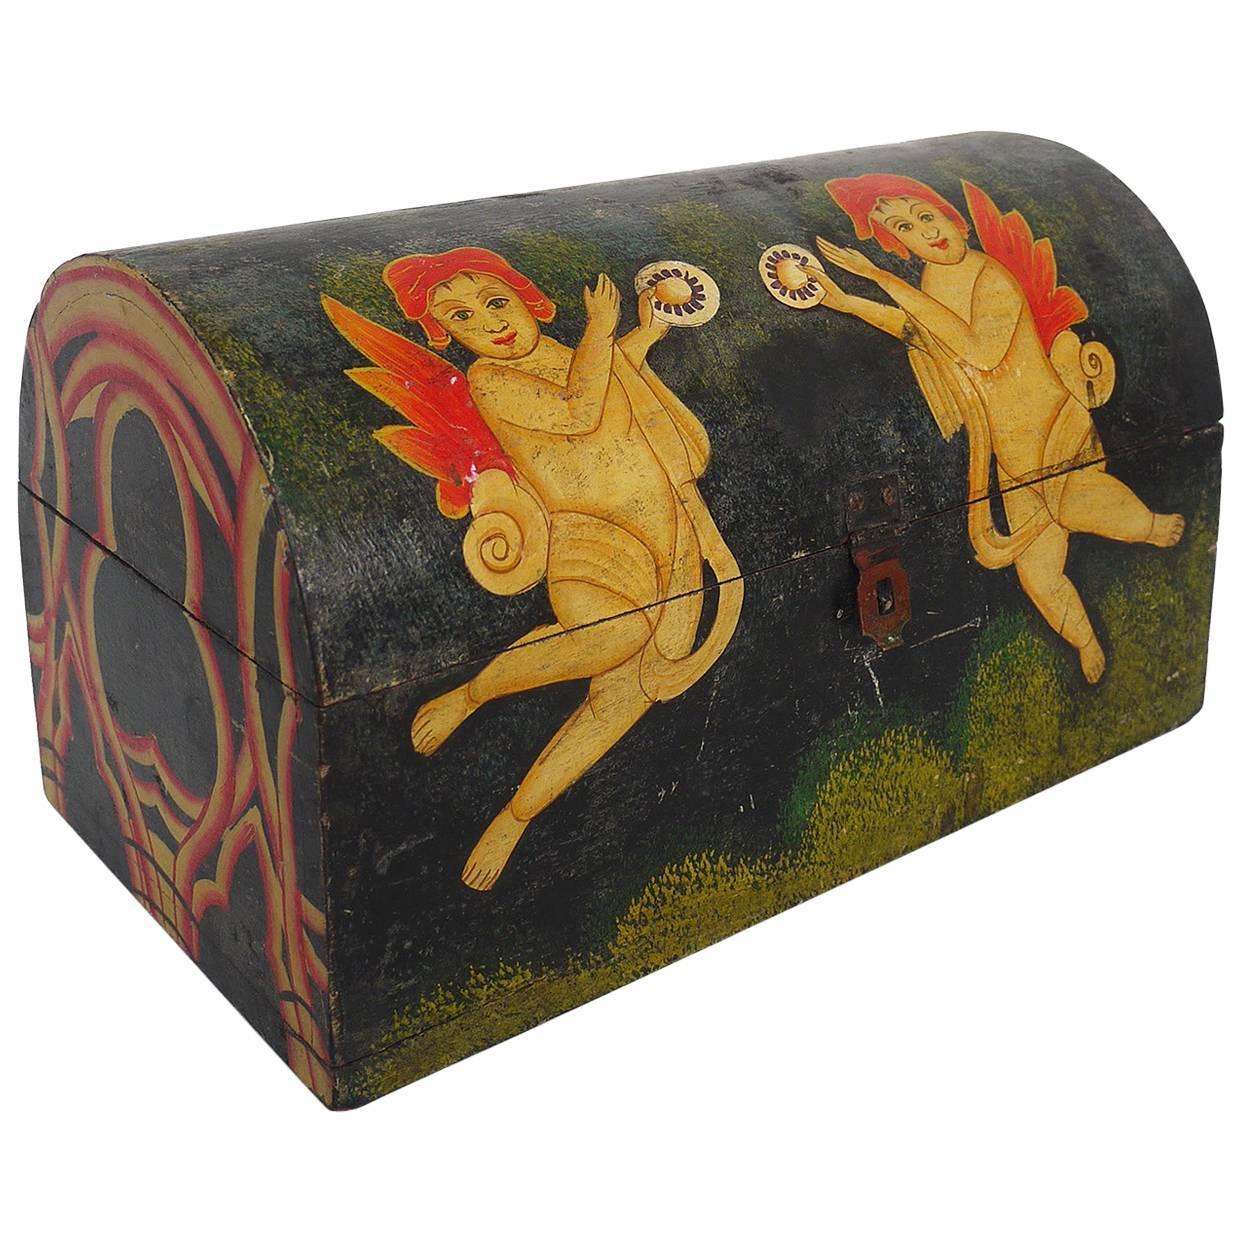 European 19th Century Painted Wooden Dome Top Box Folk Art